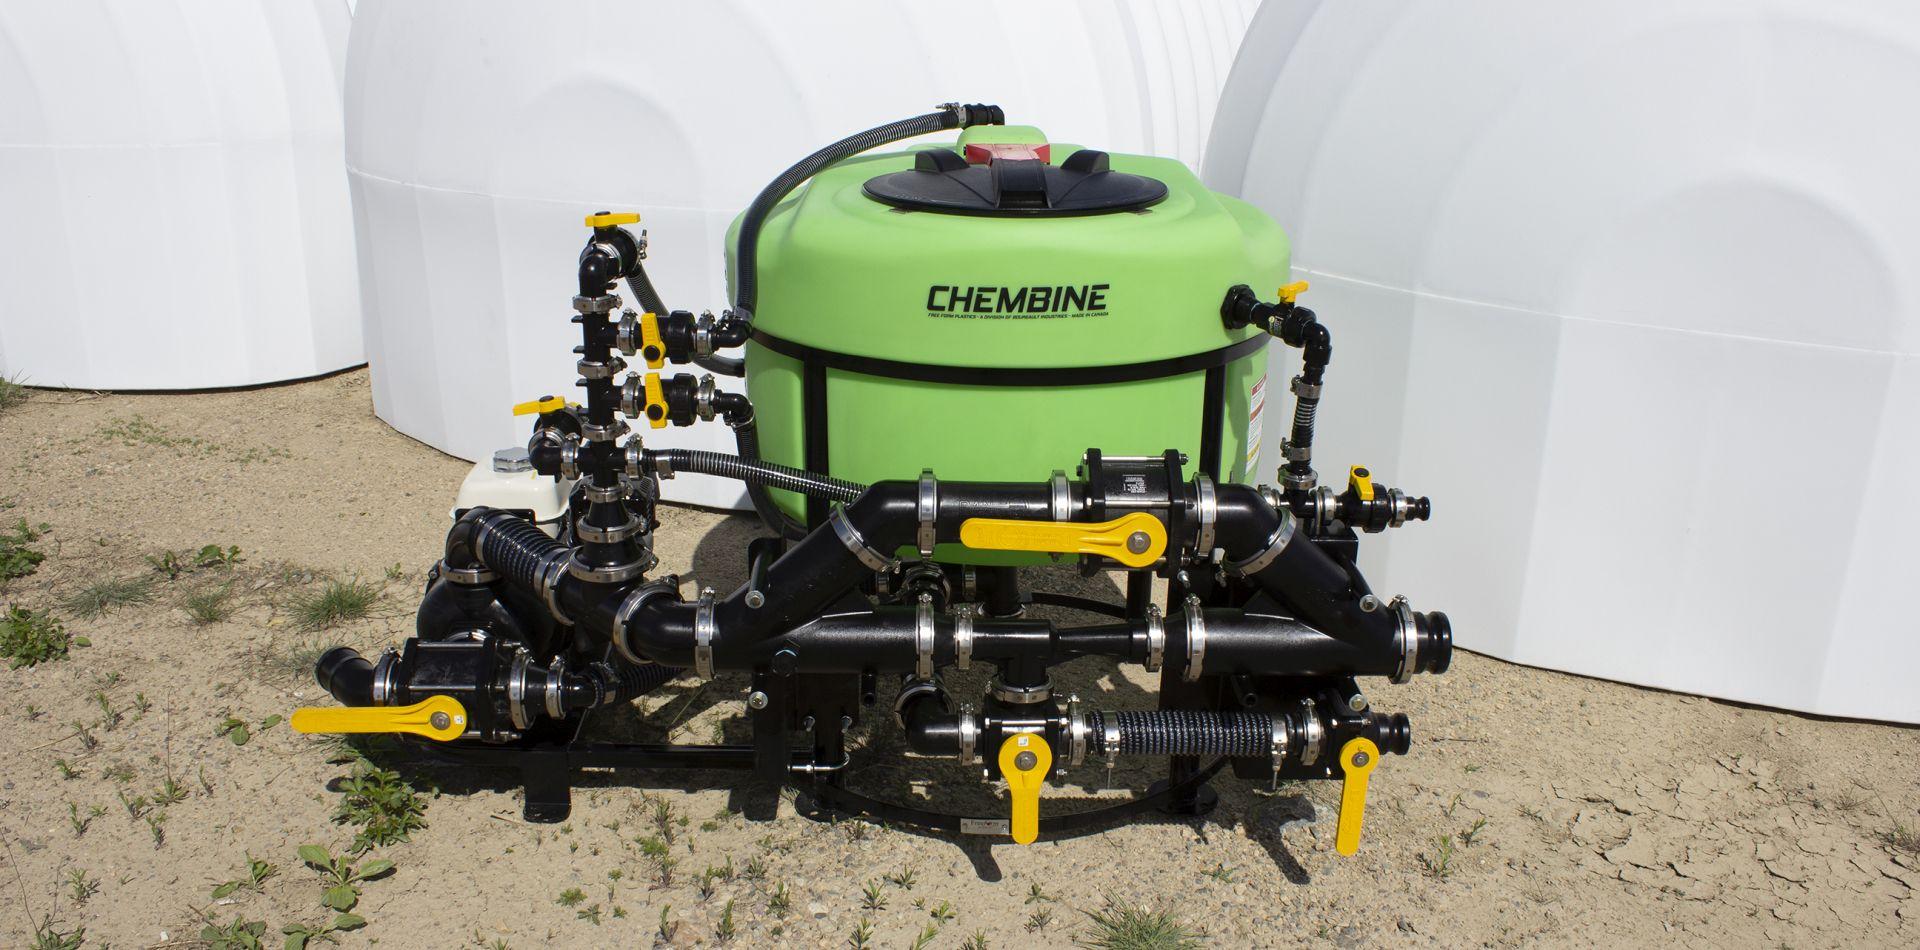 Chembine Chemical Mixer